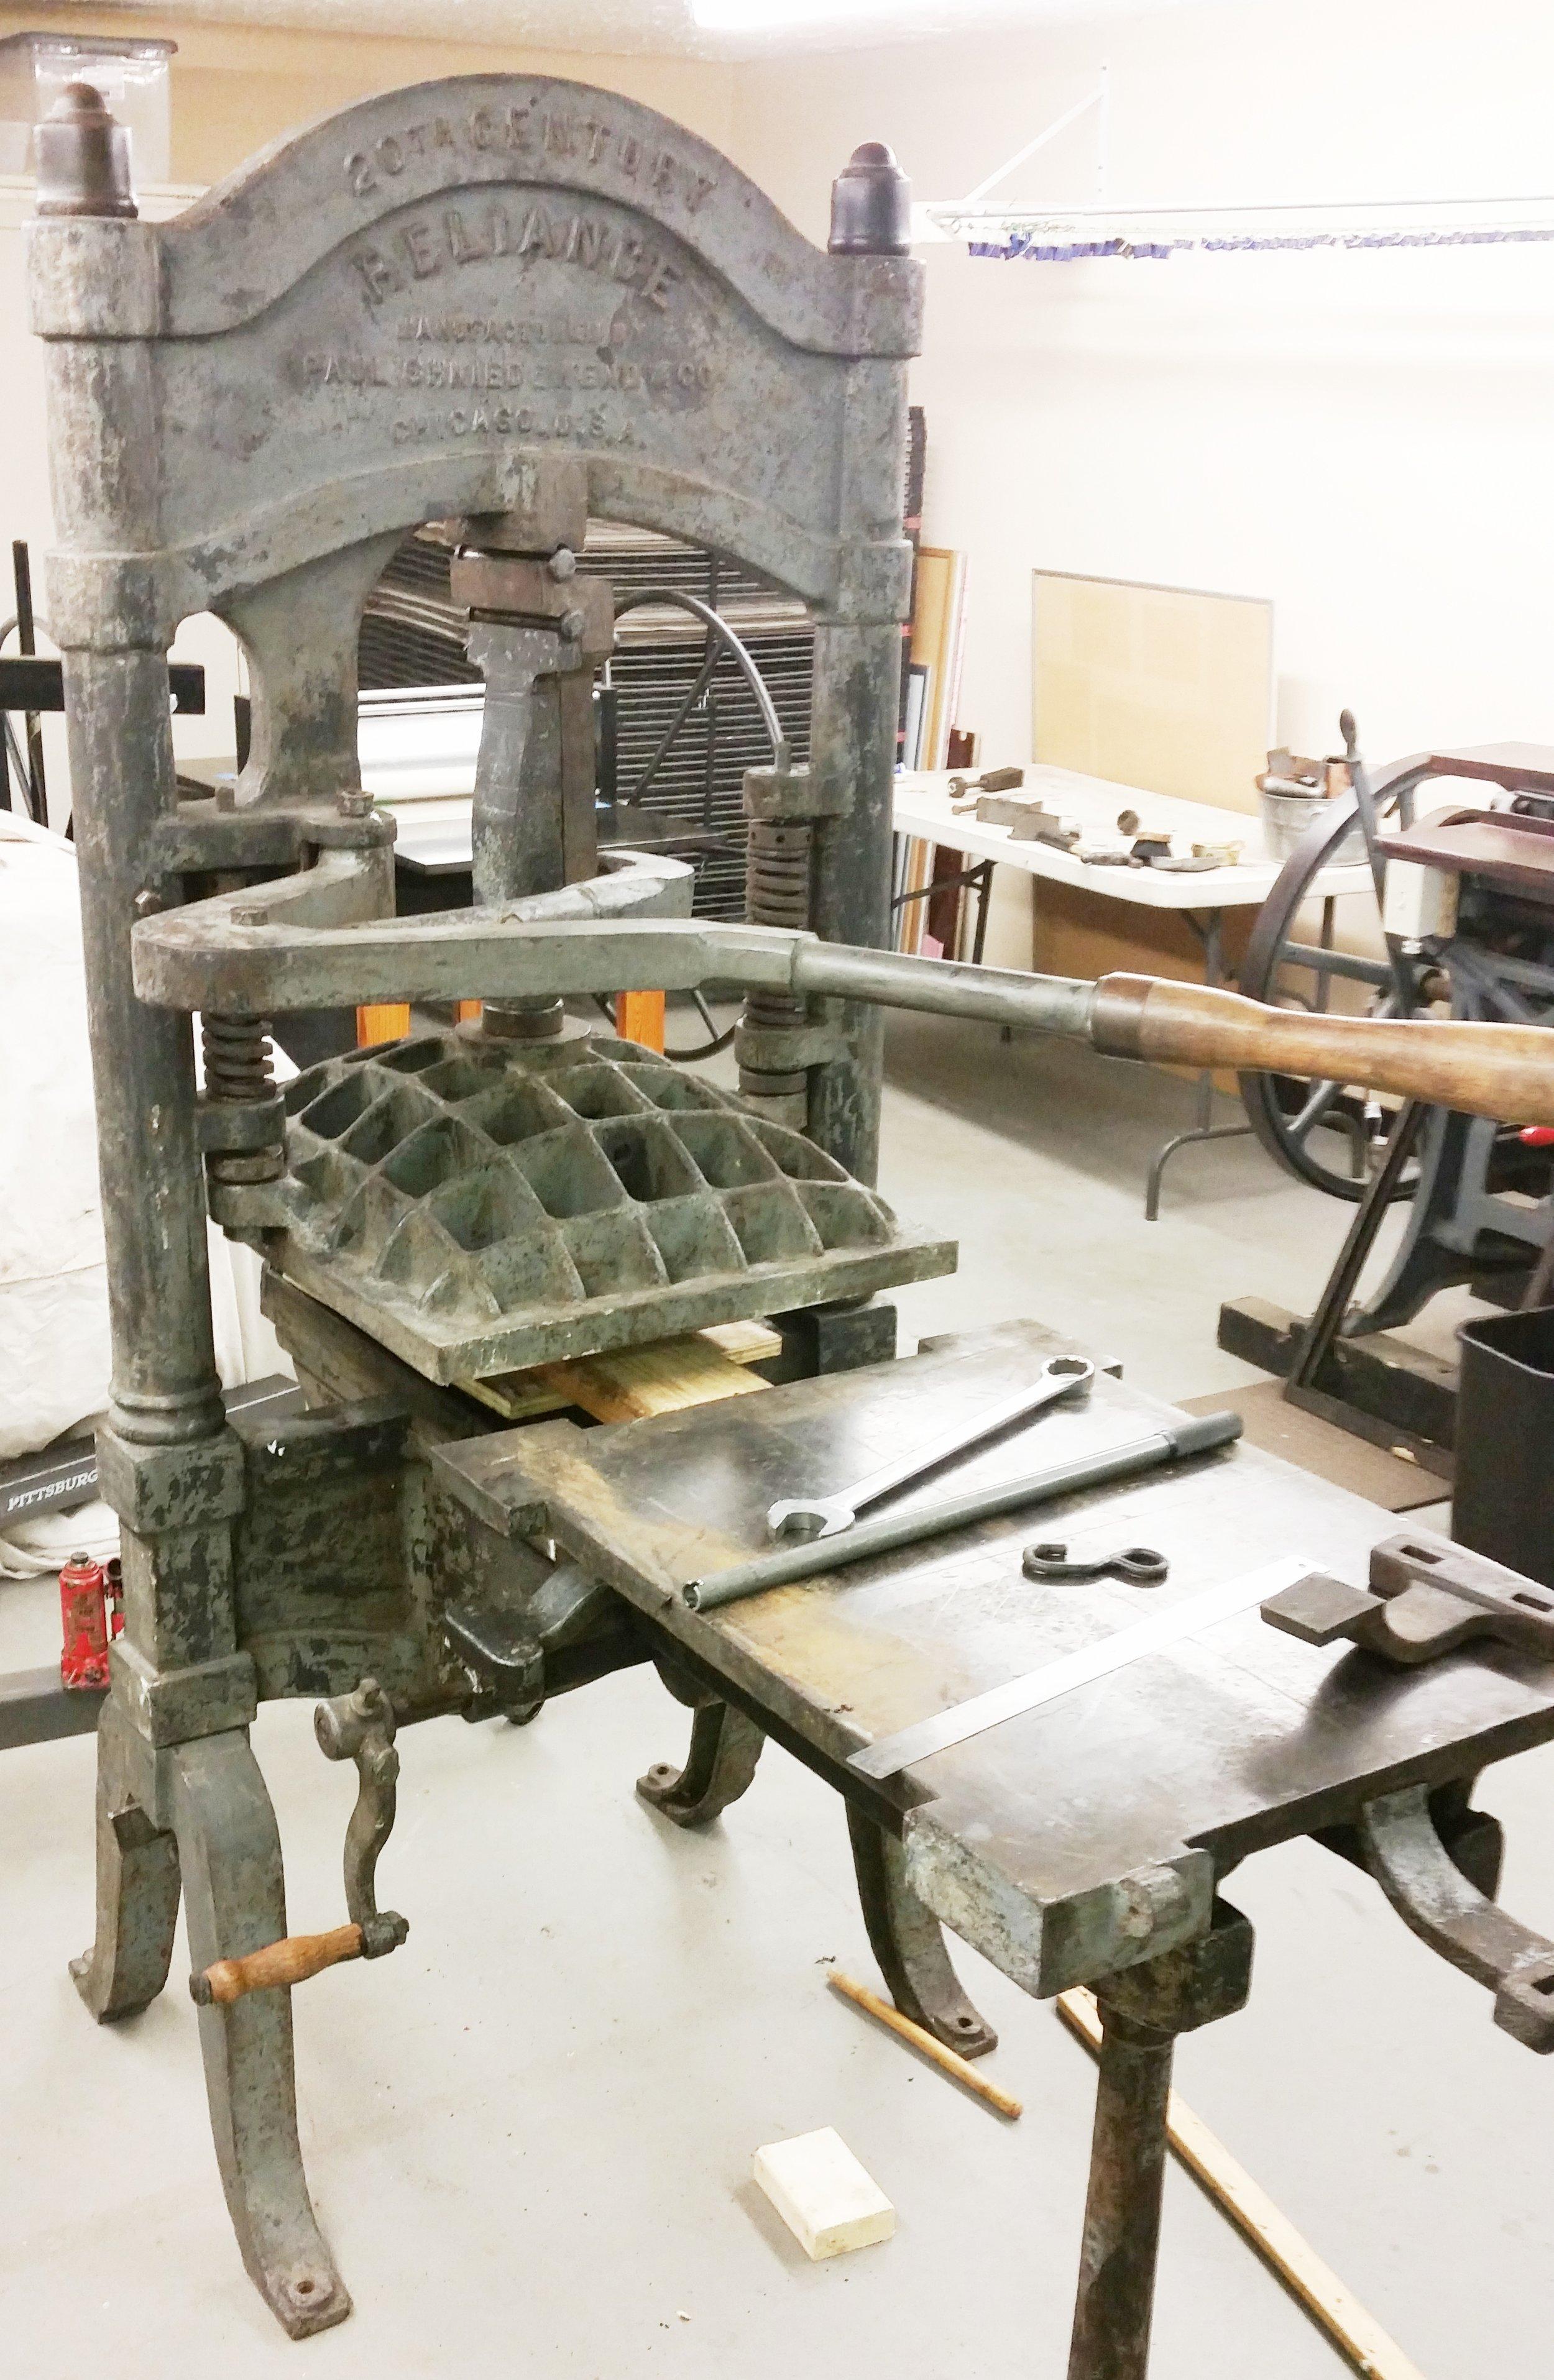 Adding and adjusting the lever mechanics